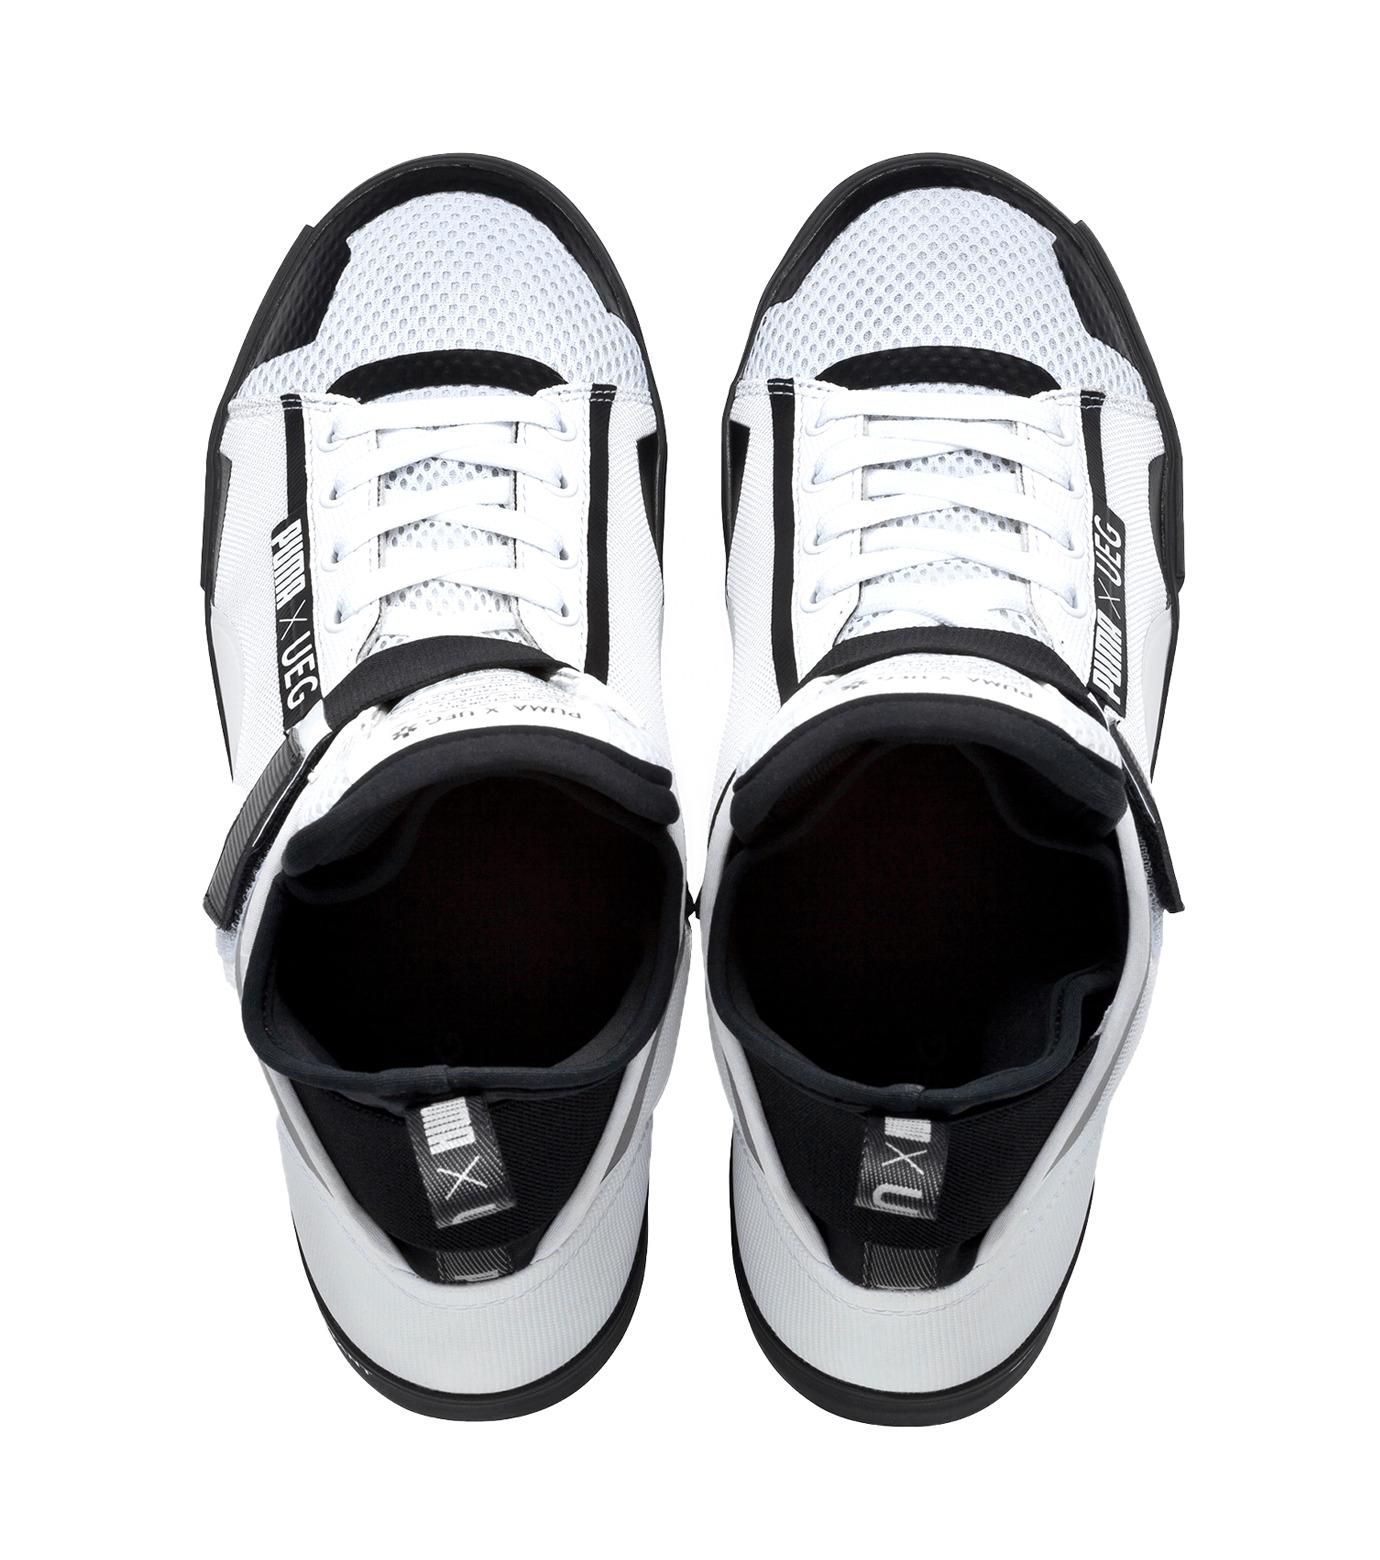 PUMA(プーマ)のCOURT PLAY X UEG-WHITE(シューズ/shoes)-361497-4 拡大詳細画像4